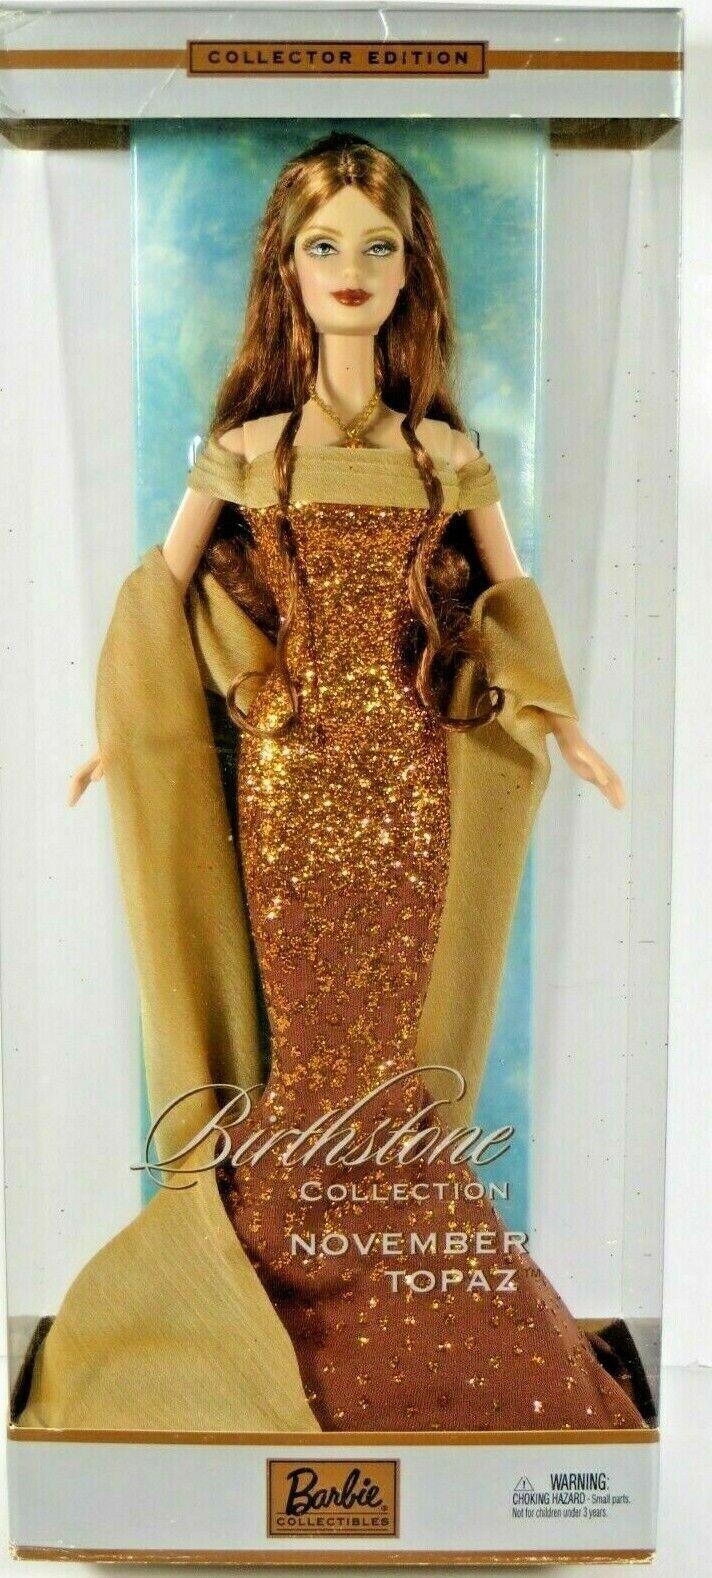 BARBIE BIRTHSTONE TOPAZ NOVEMBER NRFB - new model doll collection Mattel